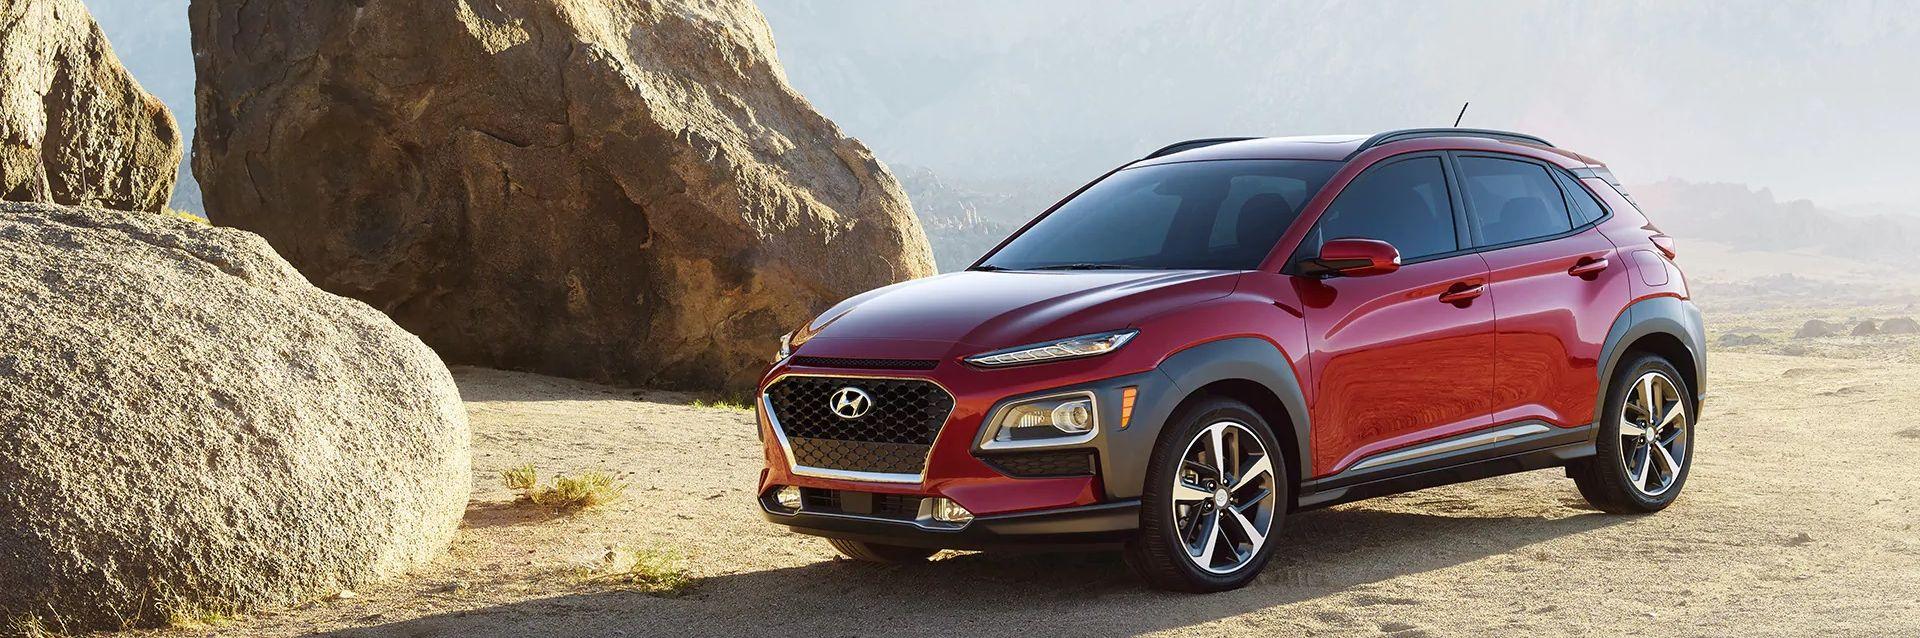 2019 Hyundai Kona Leasing near Arlington, VA - Pohanka